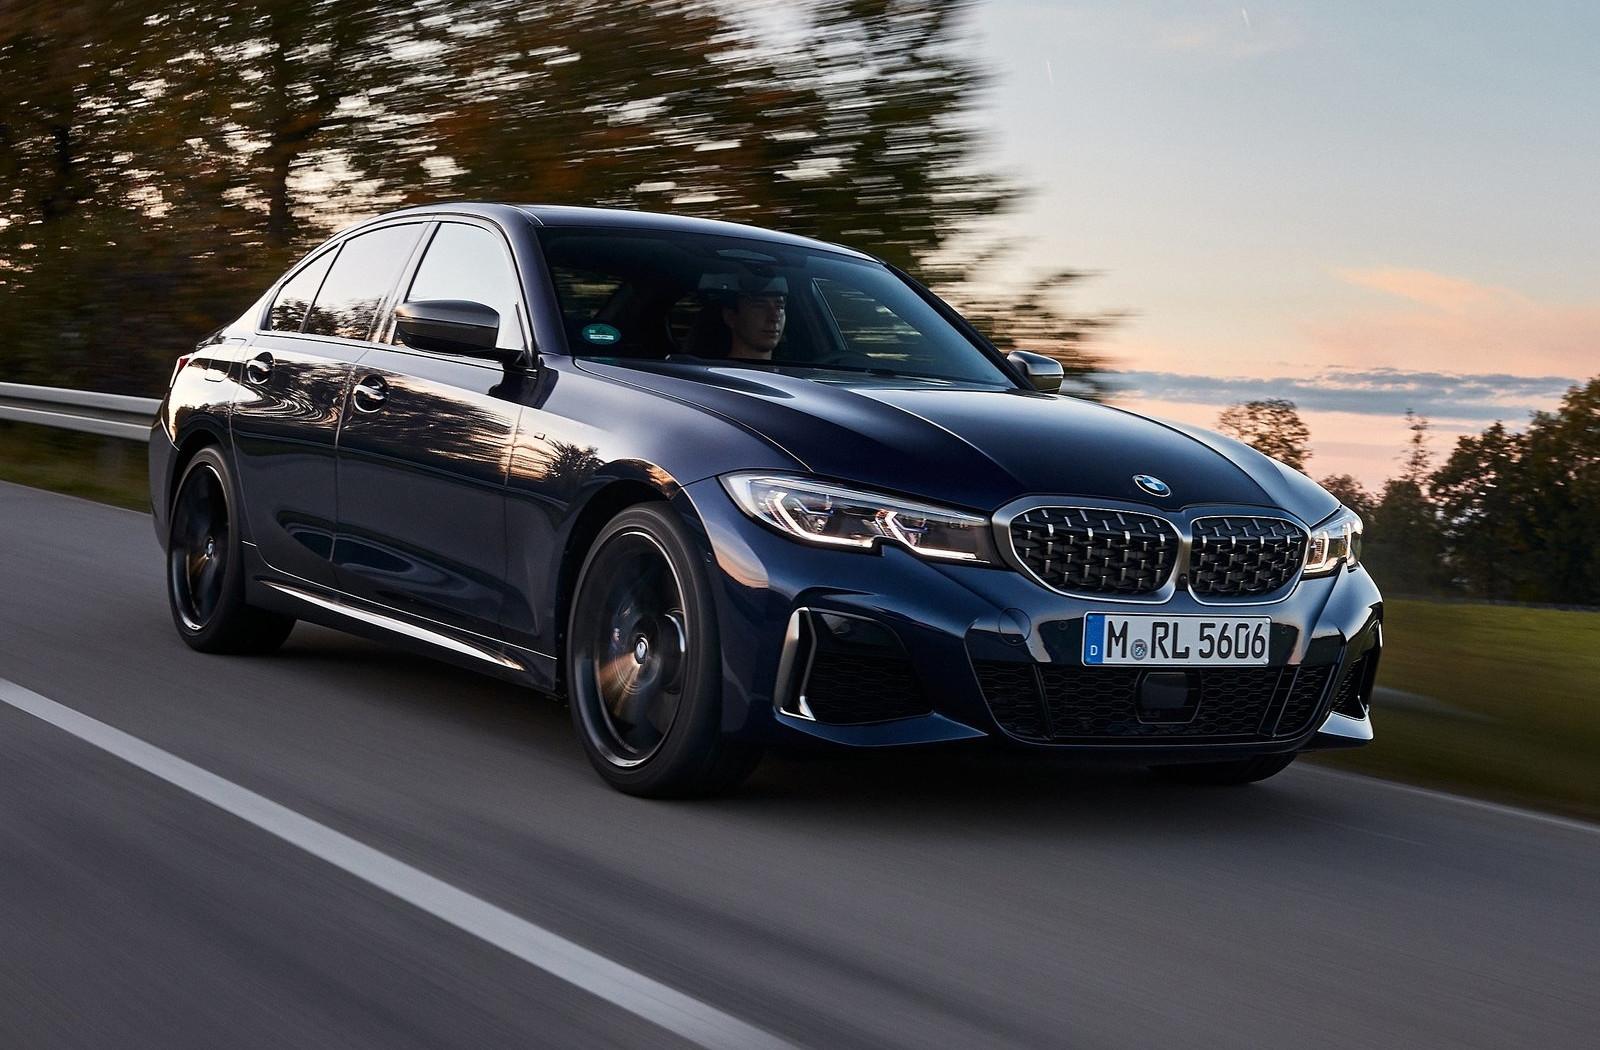 Martes de deportivos: Mercedes-AMG C 43, BMW M340i y Audi S3